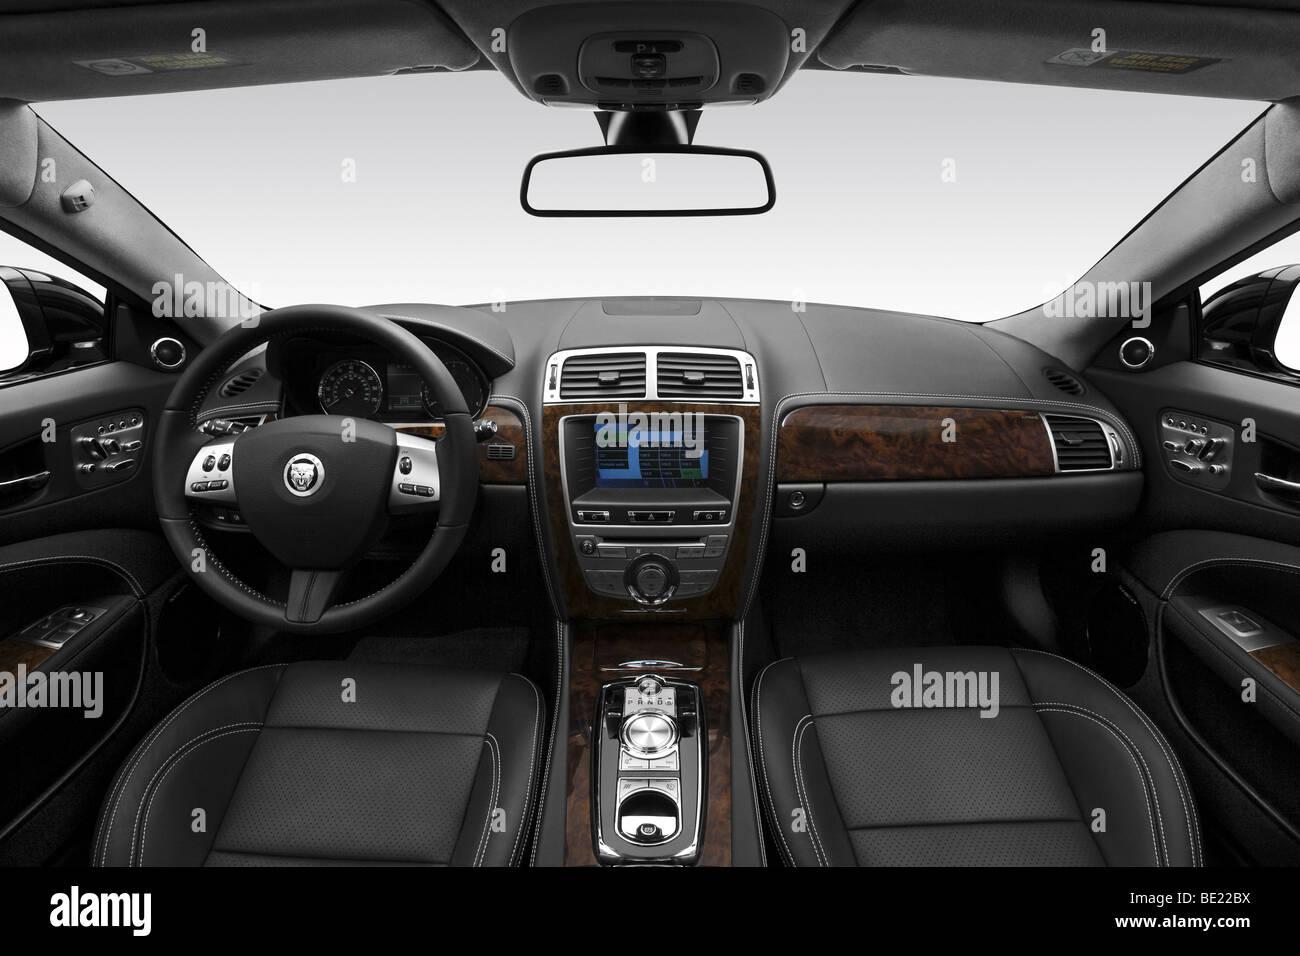 Jaguar XK convertible - Stock Image